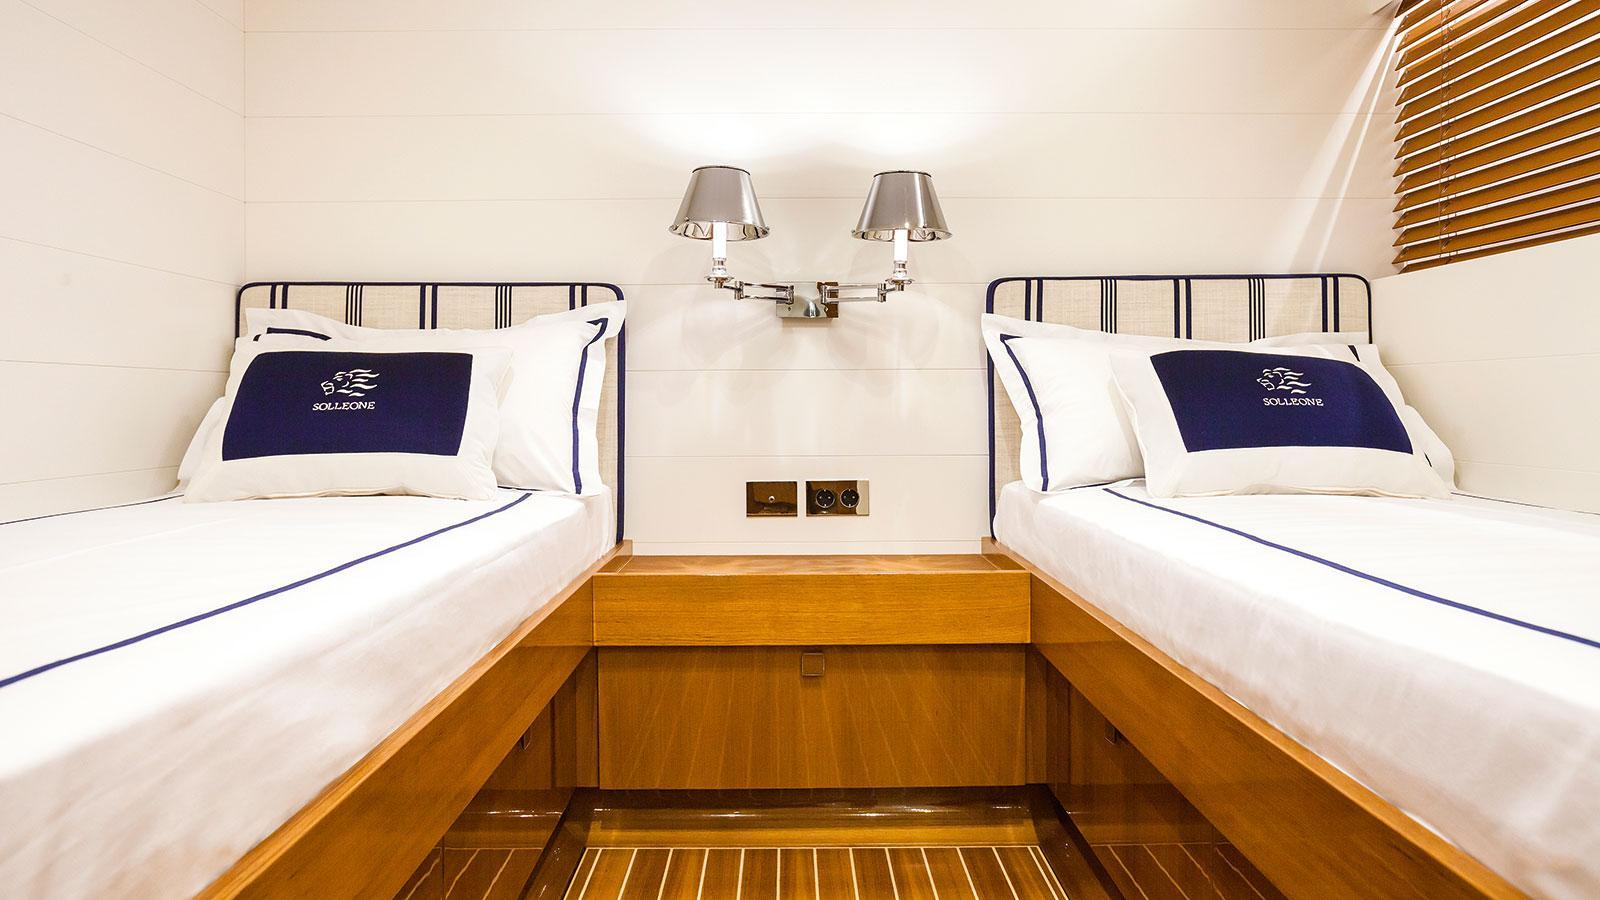 solleone-motor-yacht-nautors-swan-115-s-2015-35m-twin-guest-cabin